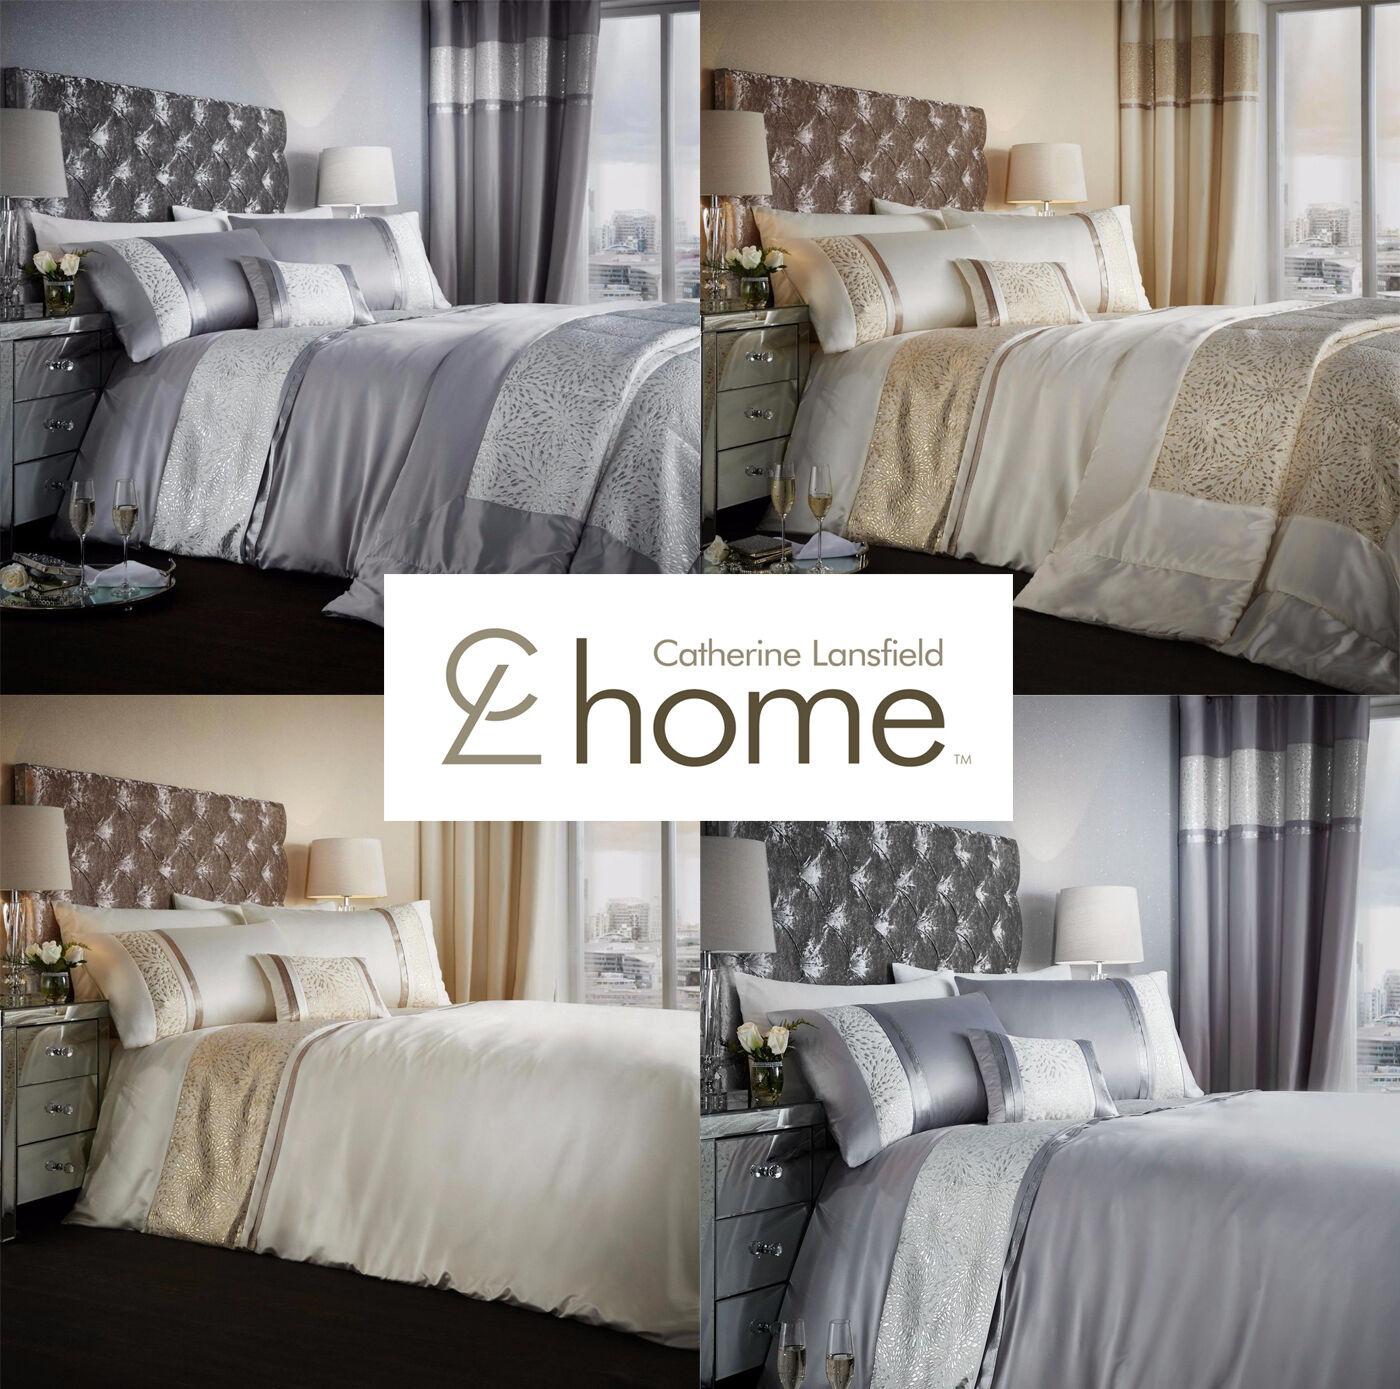 Catherine Lansfield Luxor Jacquard Duvet Quilt Cover Bed Linen Bedding